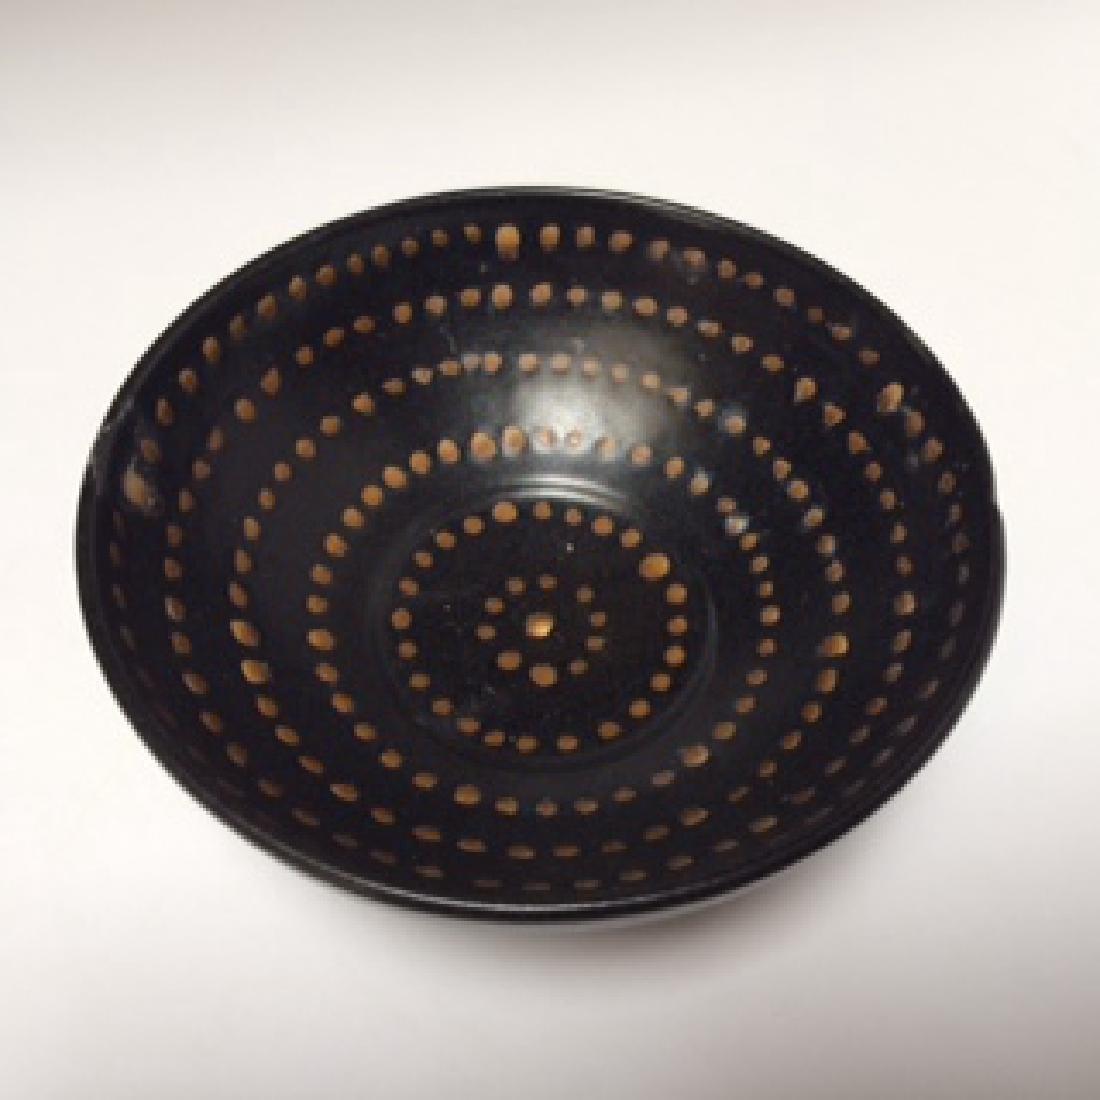 "Song Dynasty Jie Zhou Ware Porcelain Bowl ""Slight"